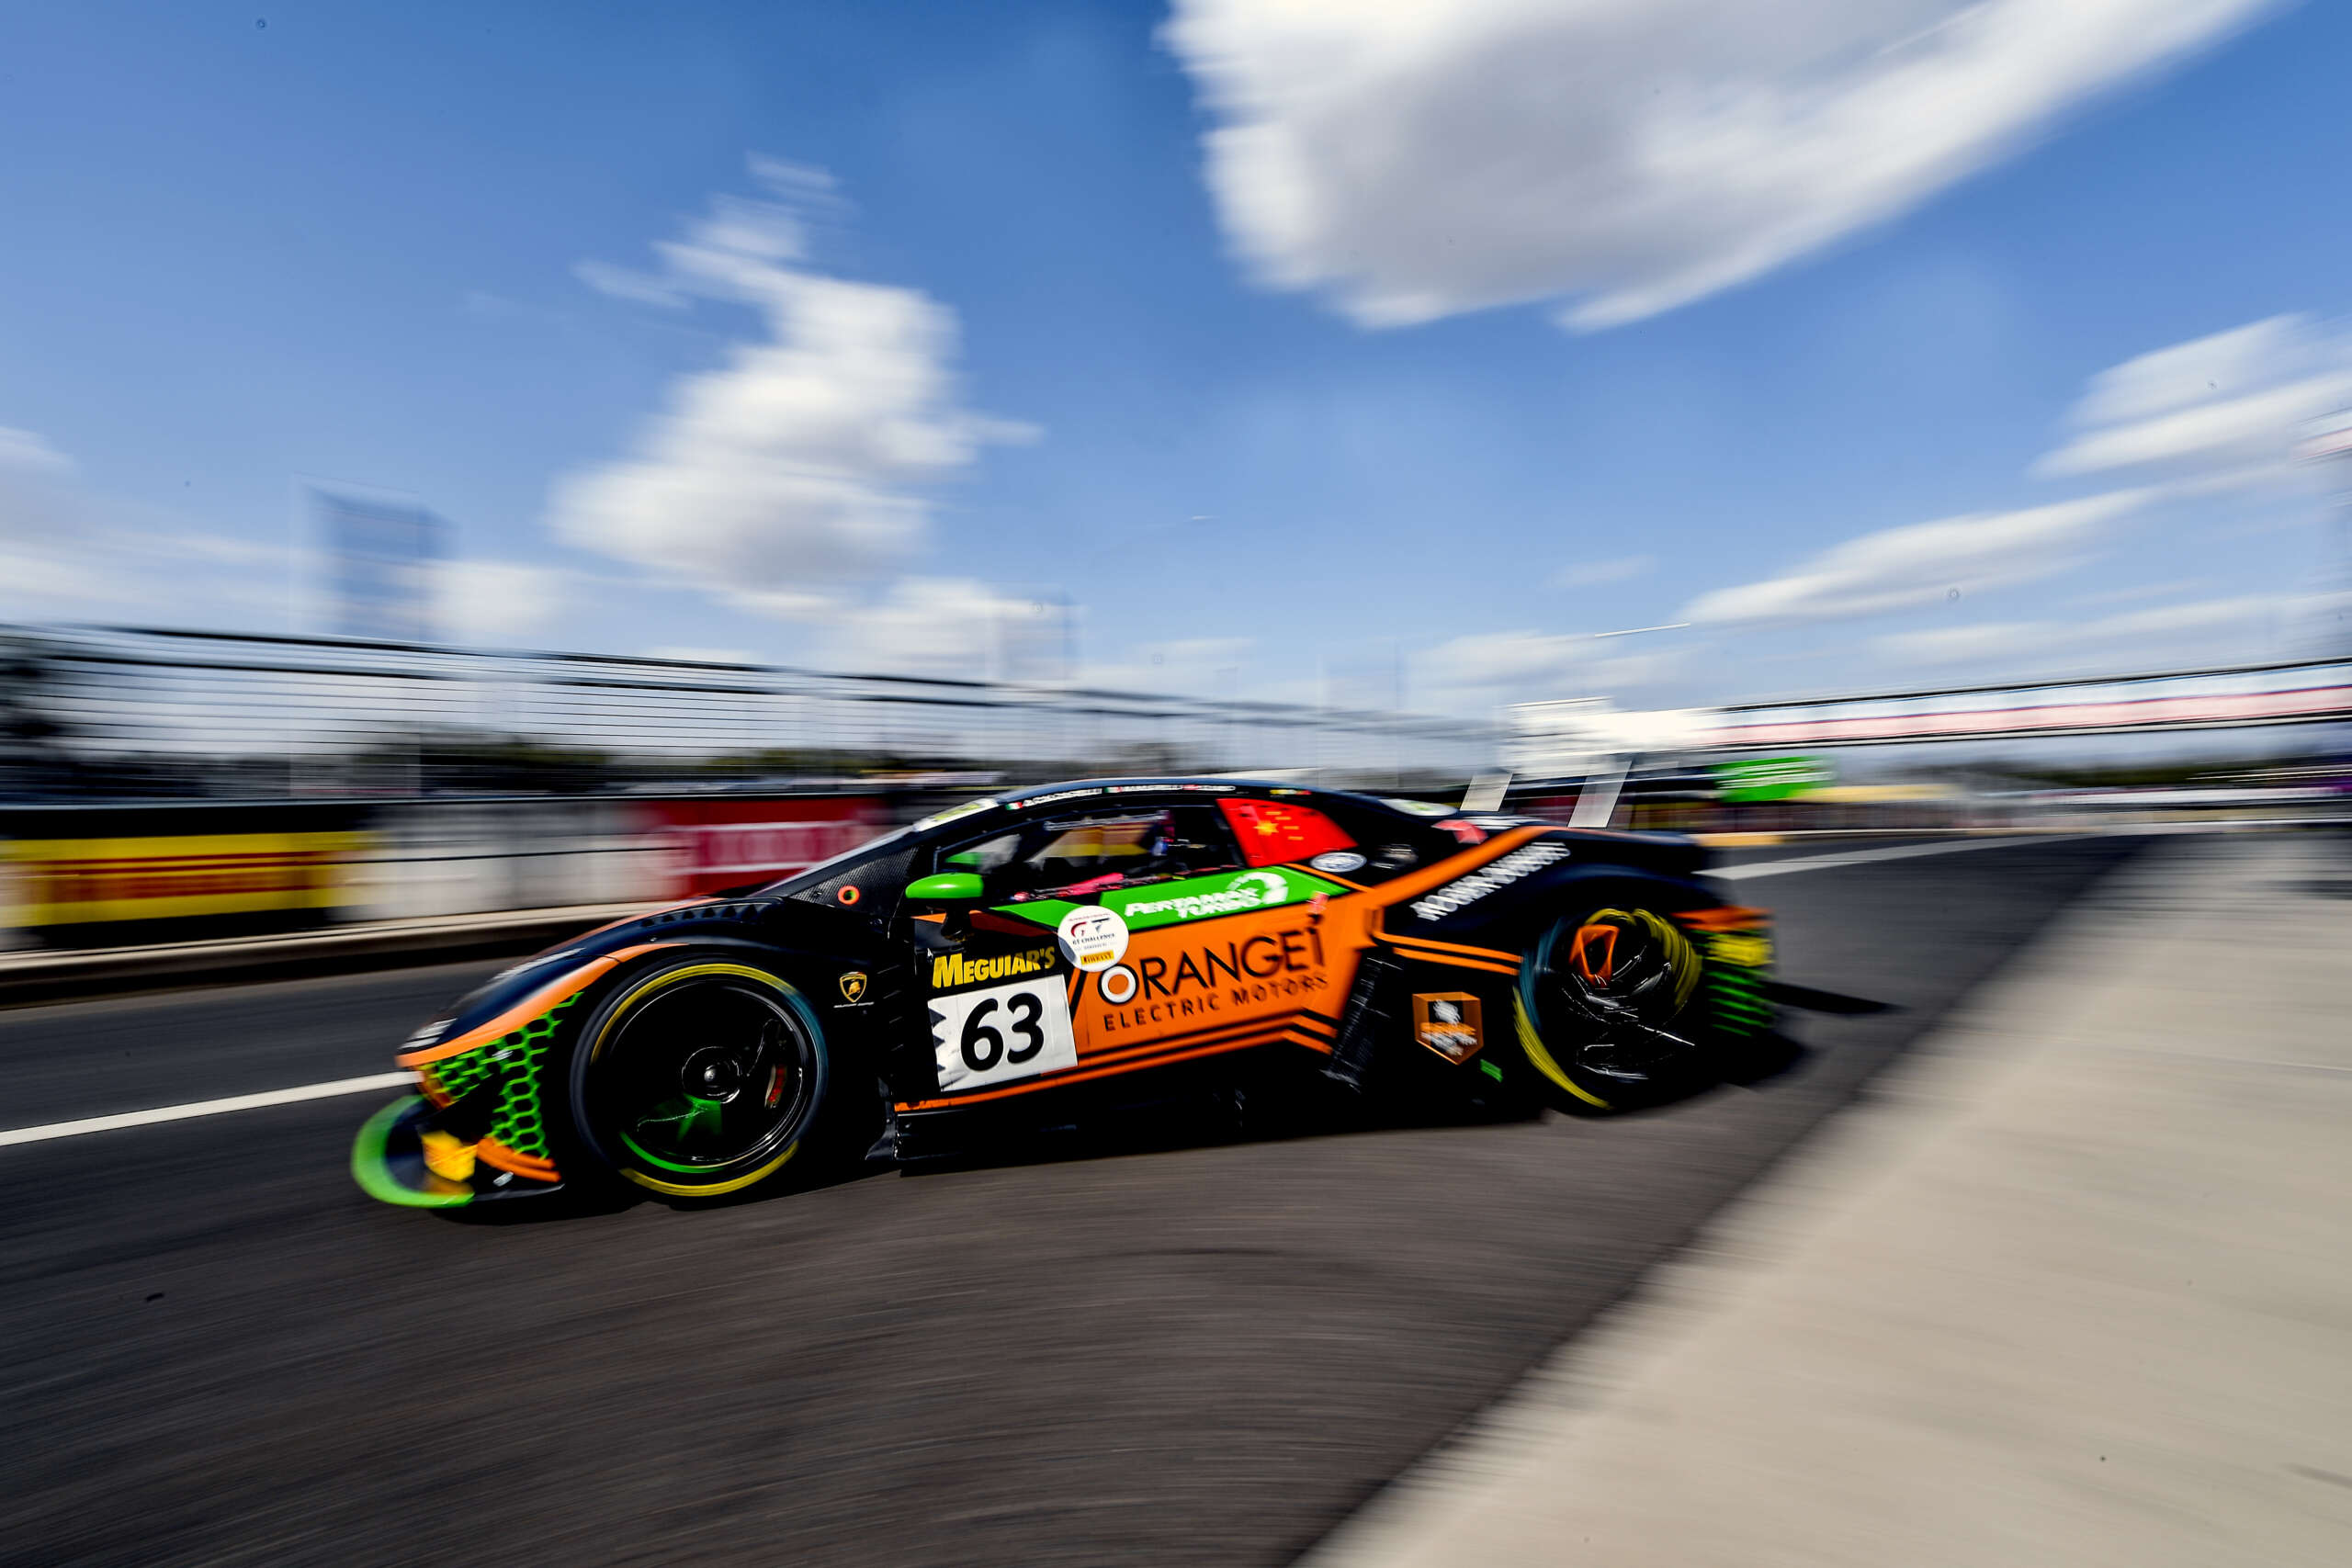 ORANGE1 FFF Racing Team by ACM unveils its 2020 line-up